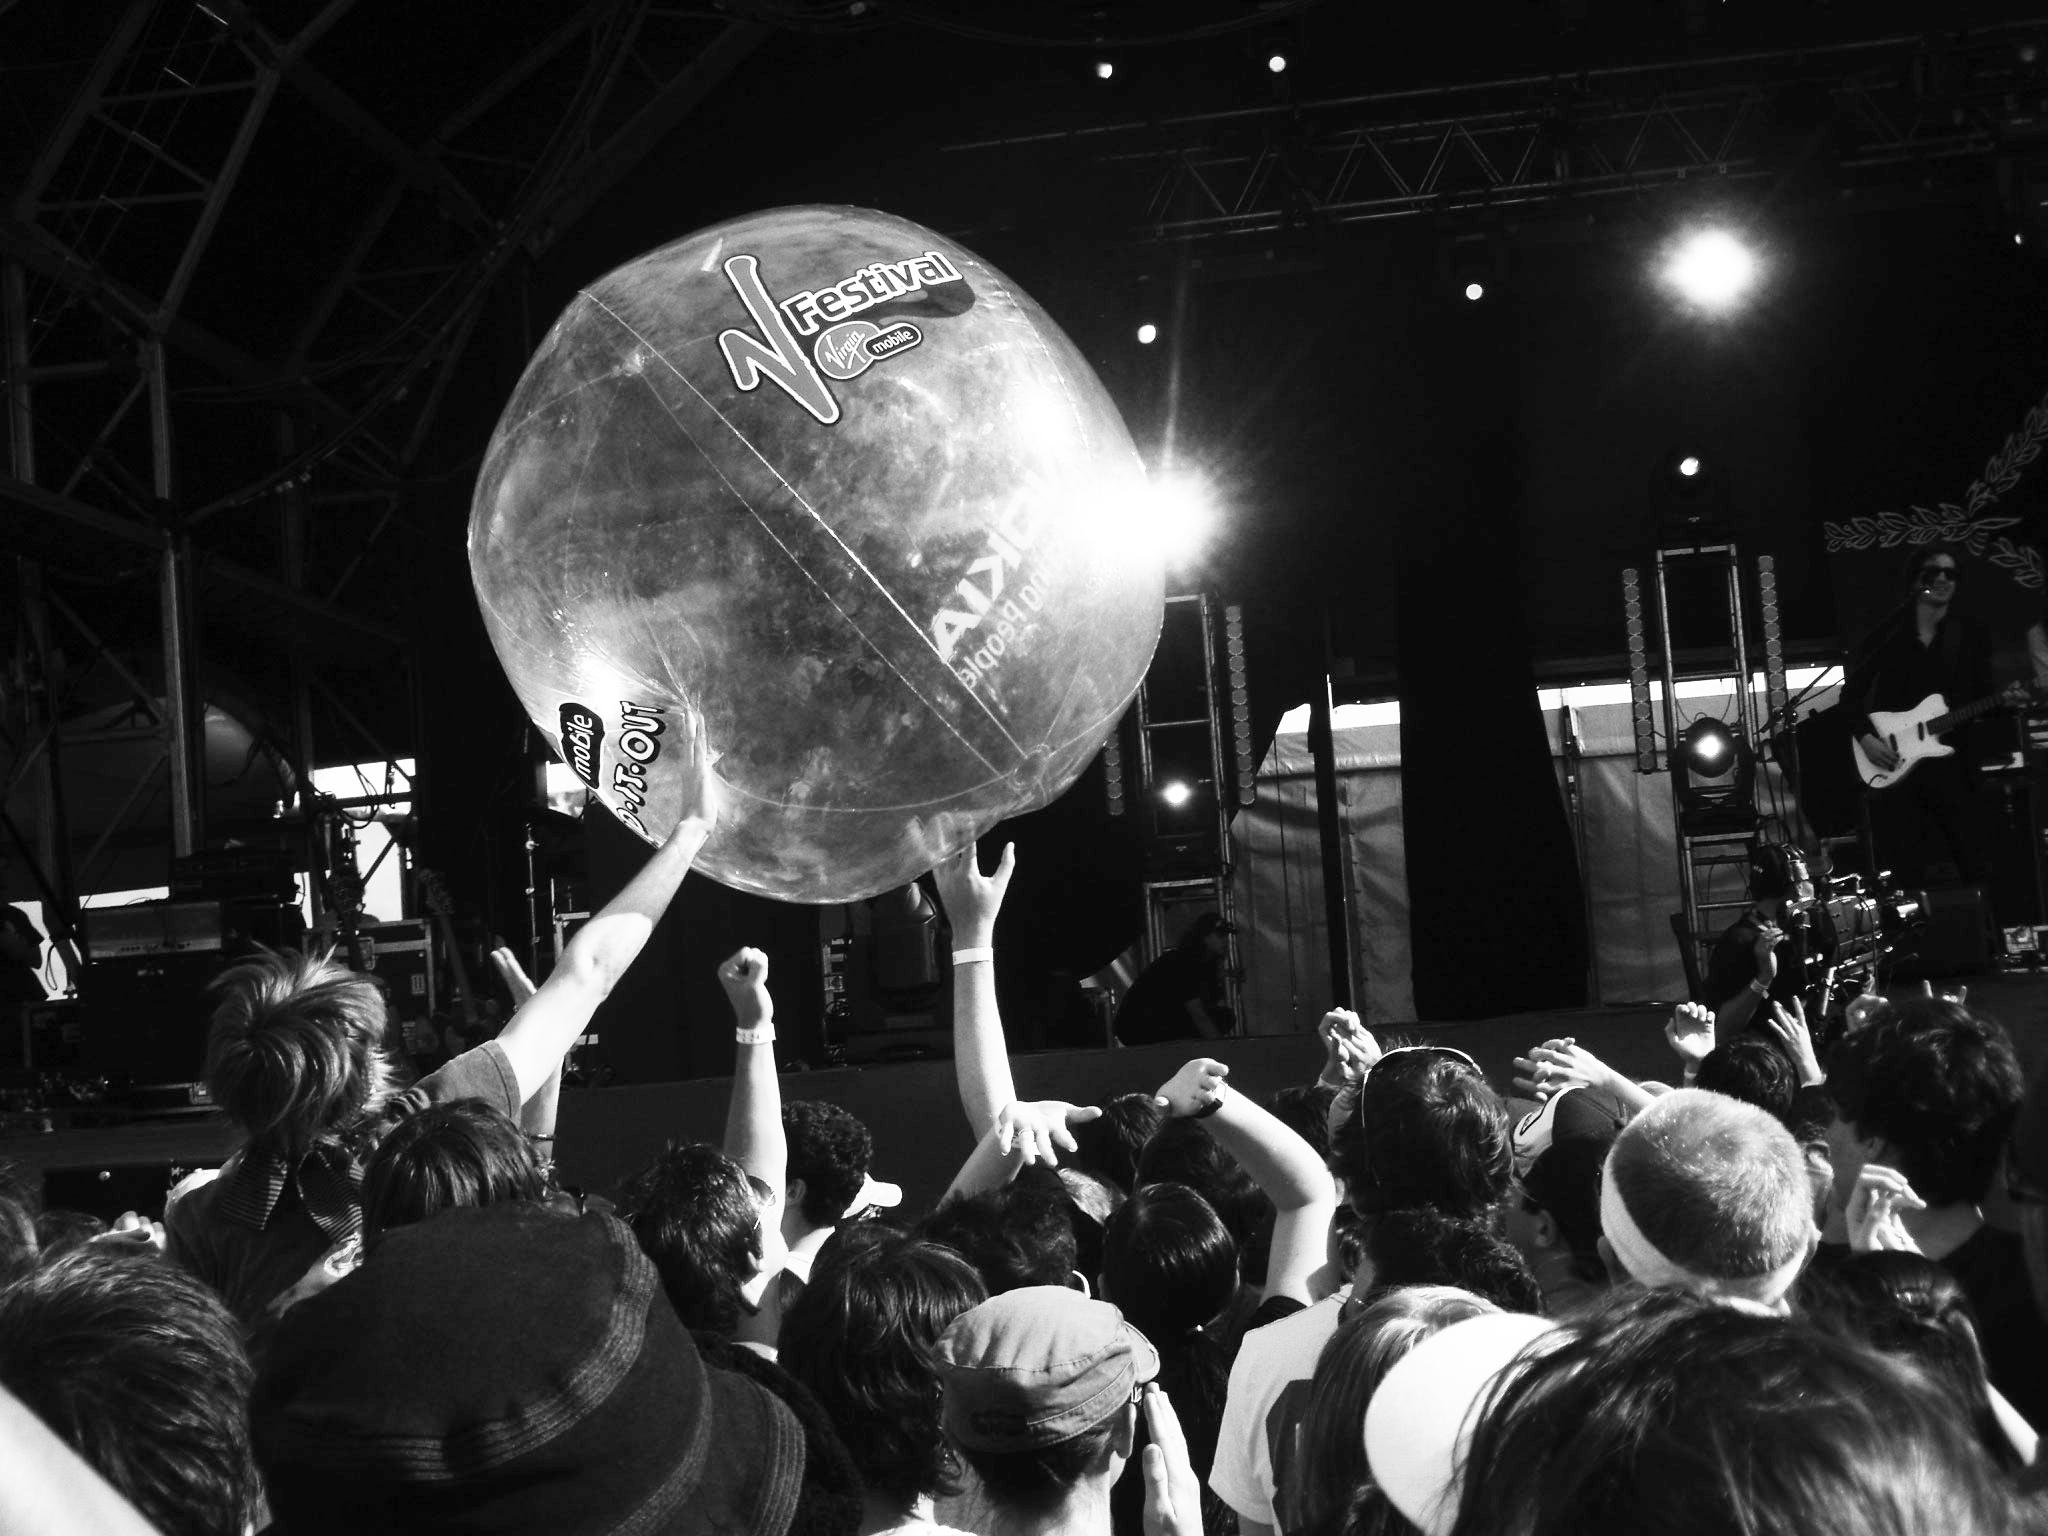 A beach ball in the crowd at the V festival Australia, 2007.